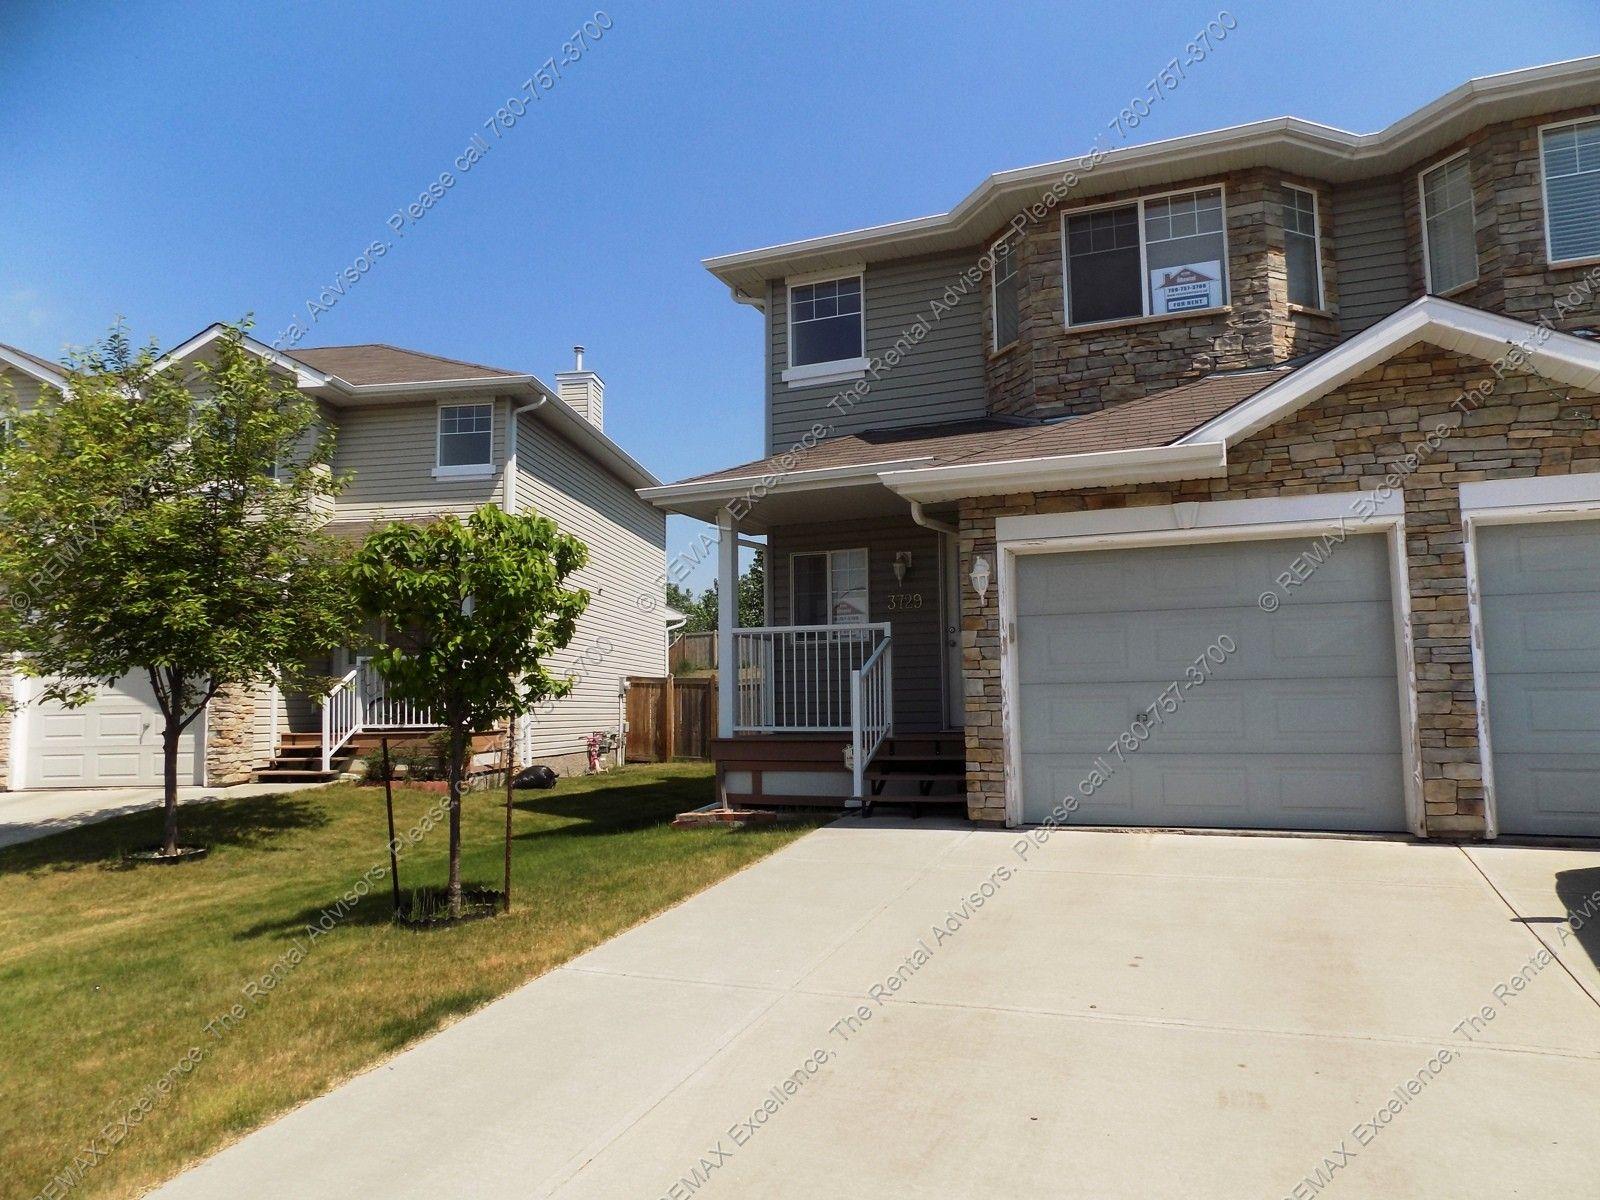 Calgary Edmonton Residential Property Management For Rent Property Rental Property Property Management